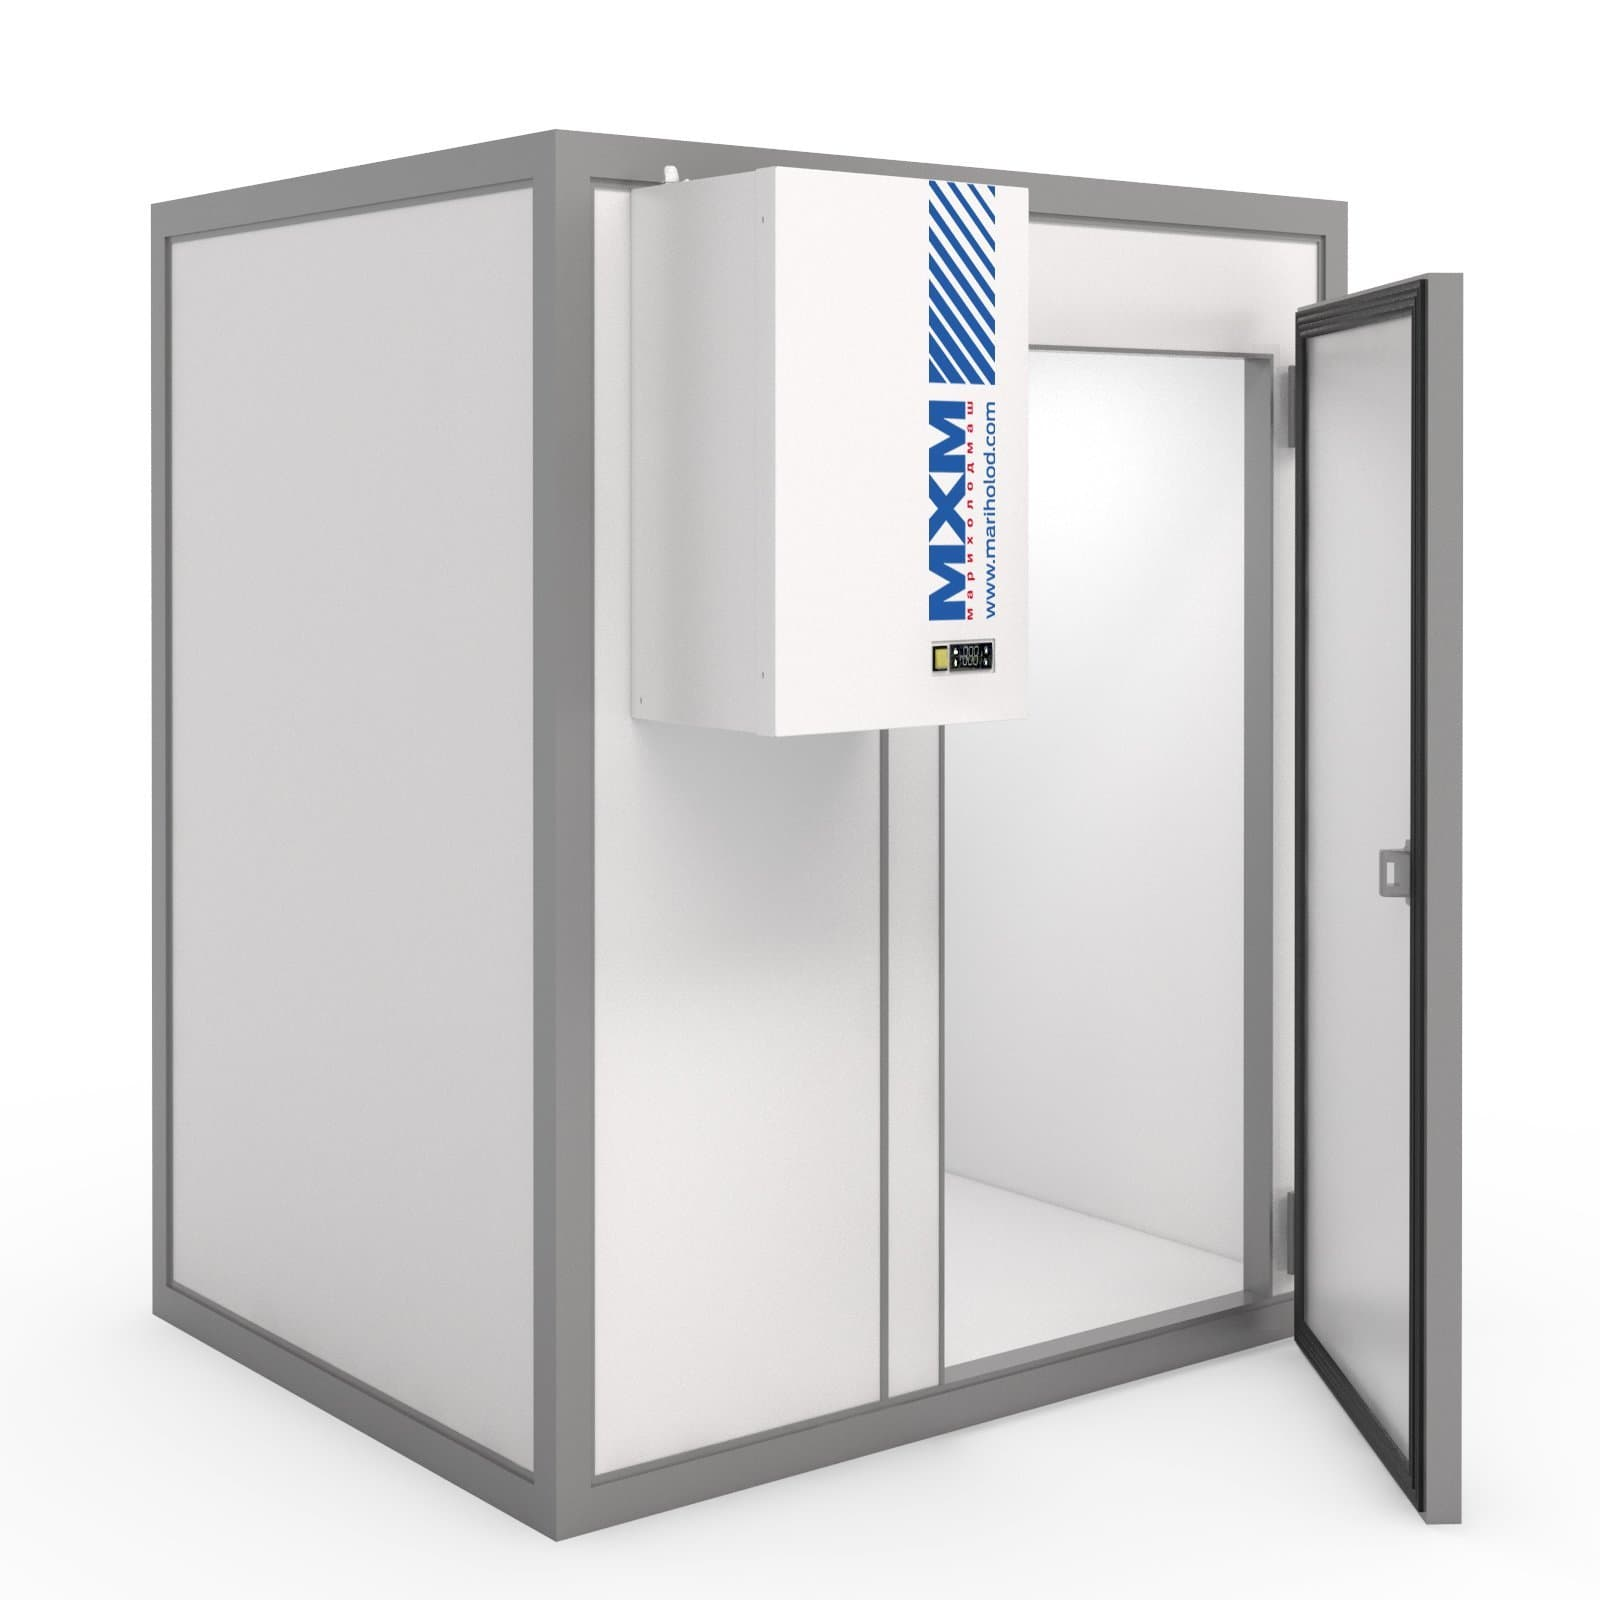 Камера холодильная КХН-94,39 (2560×17260×2460 мм)